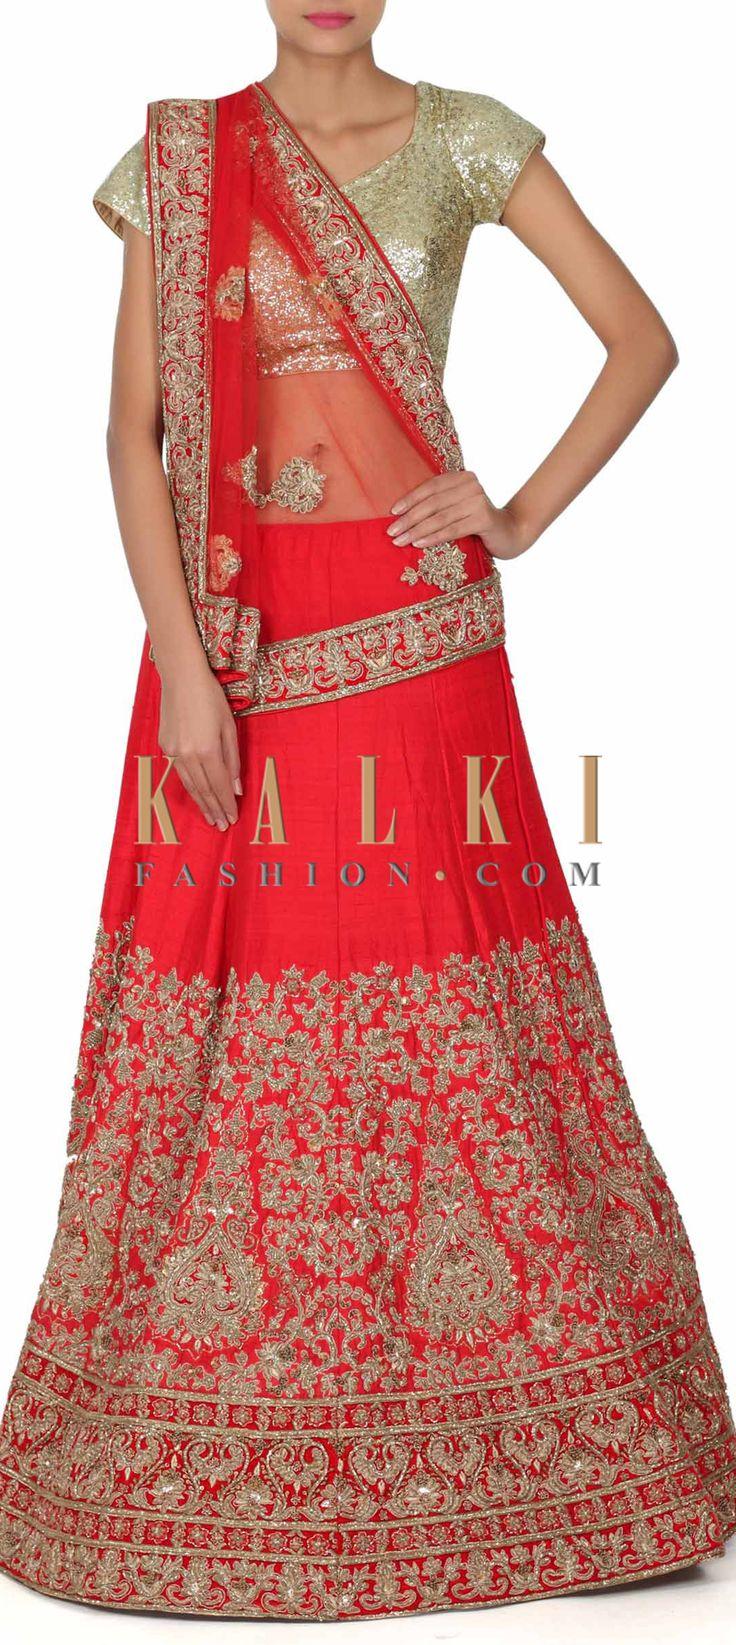 Buy this Red lehenga adorn in zardosi embroidery only on Kalki